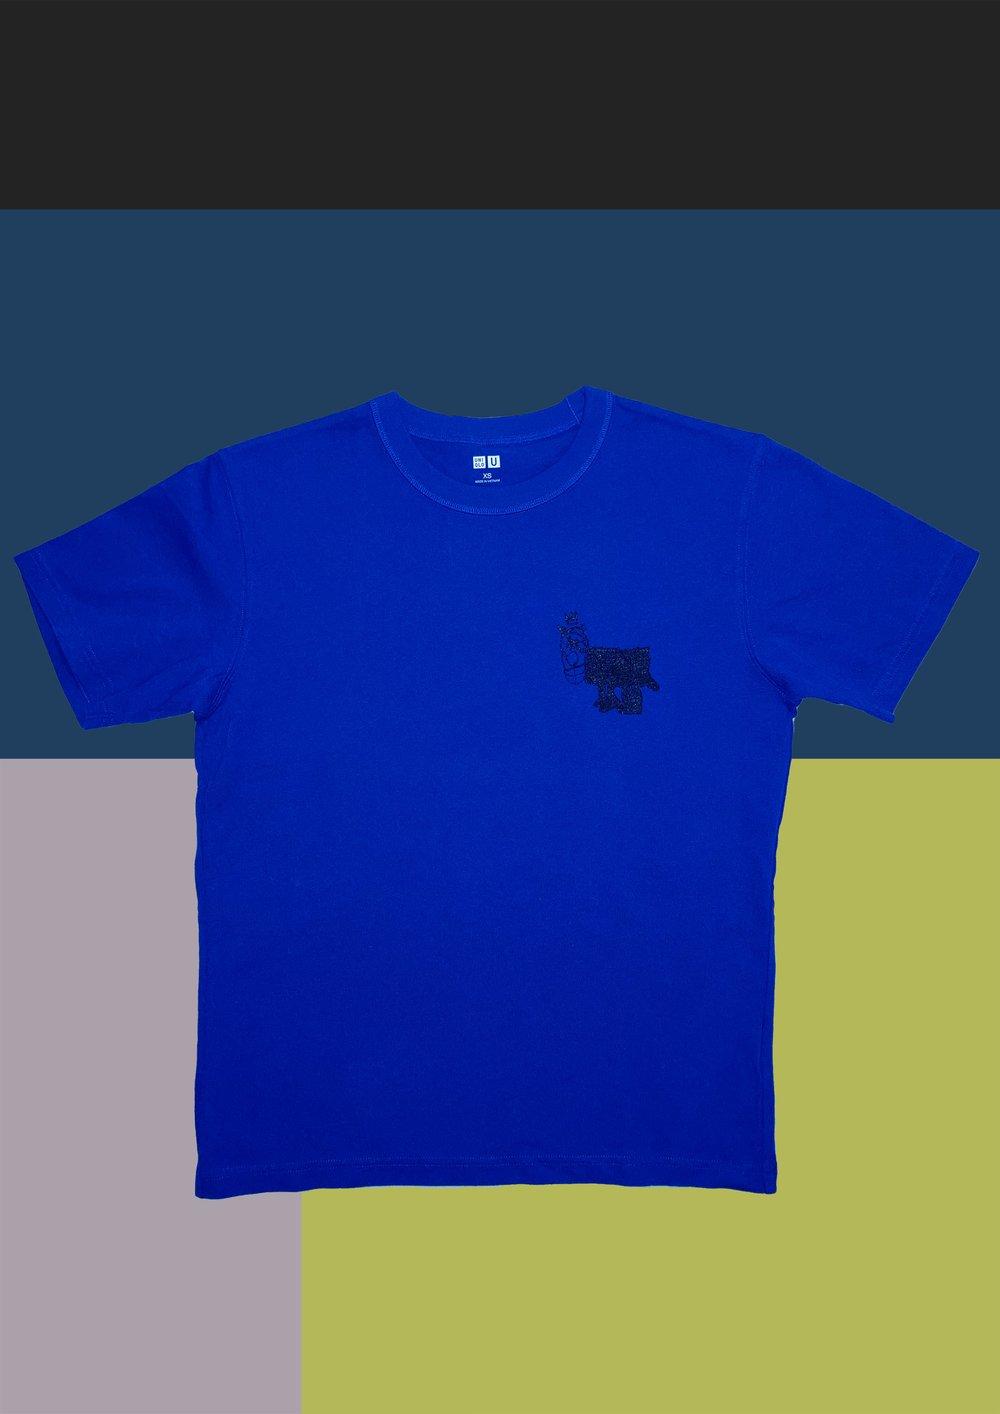 Blacksheep x Never Conform classic logo shirt